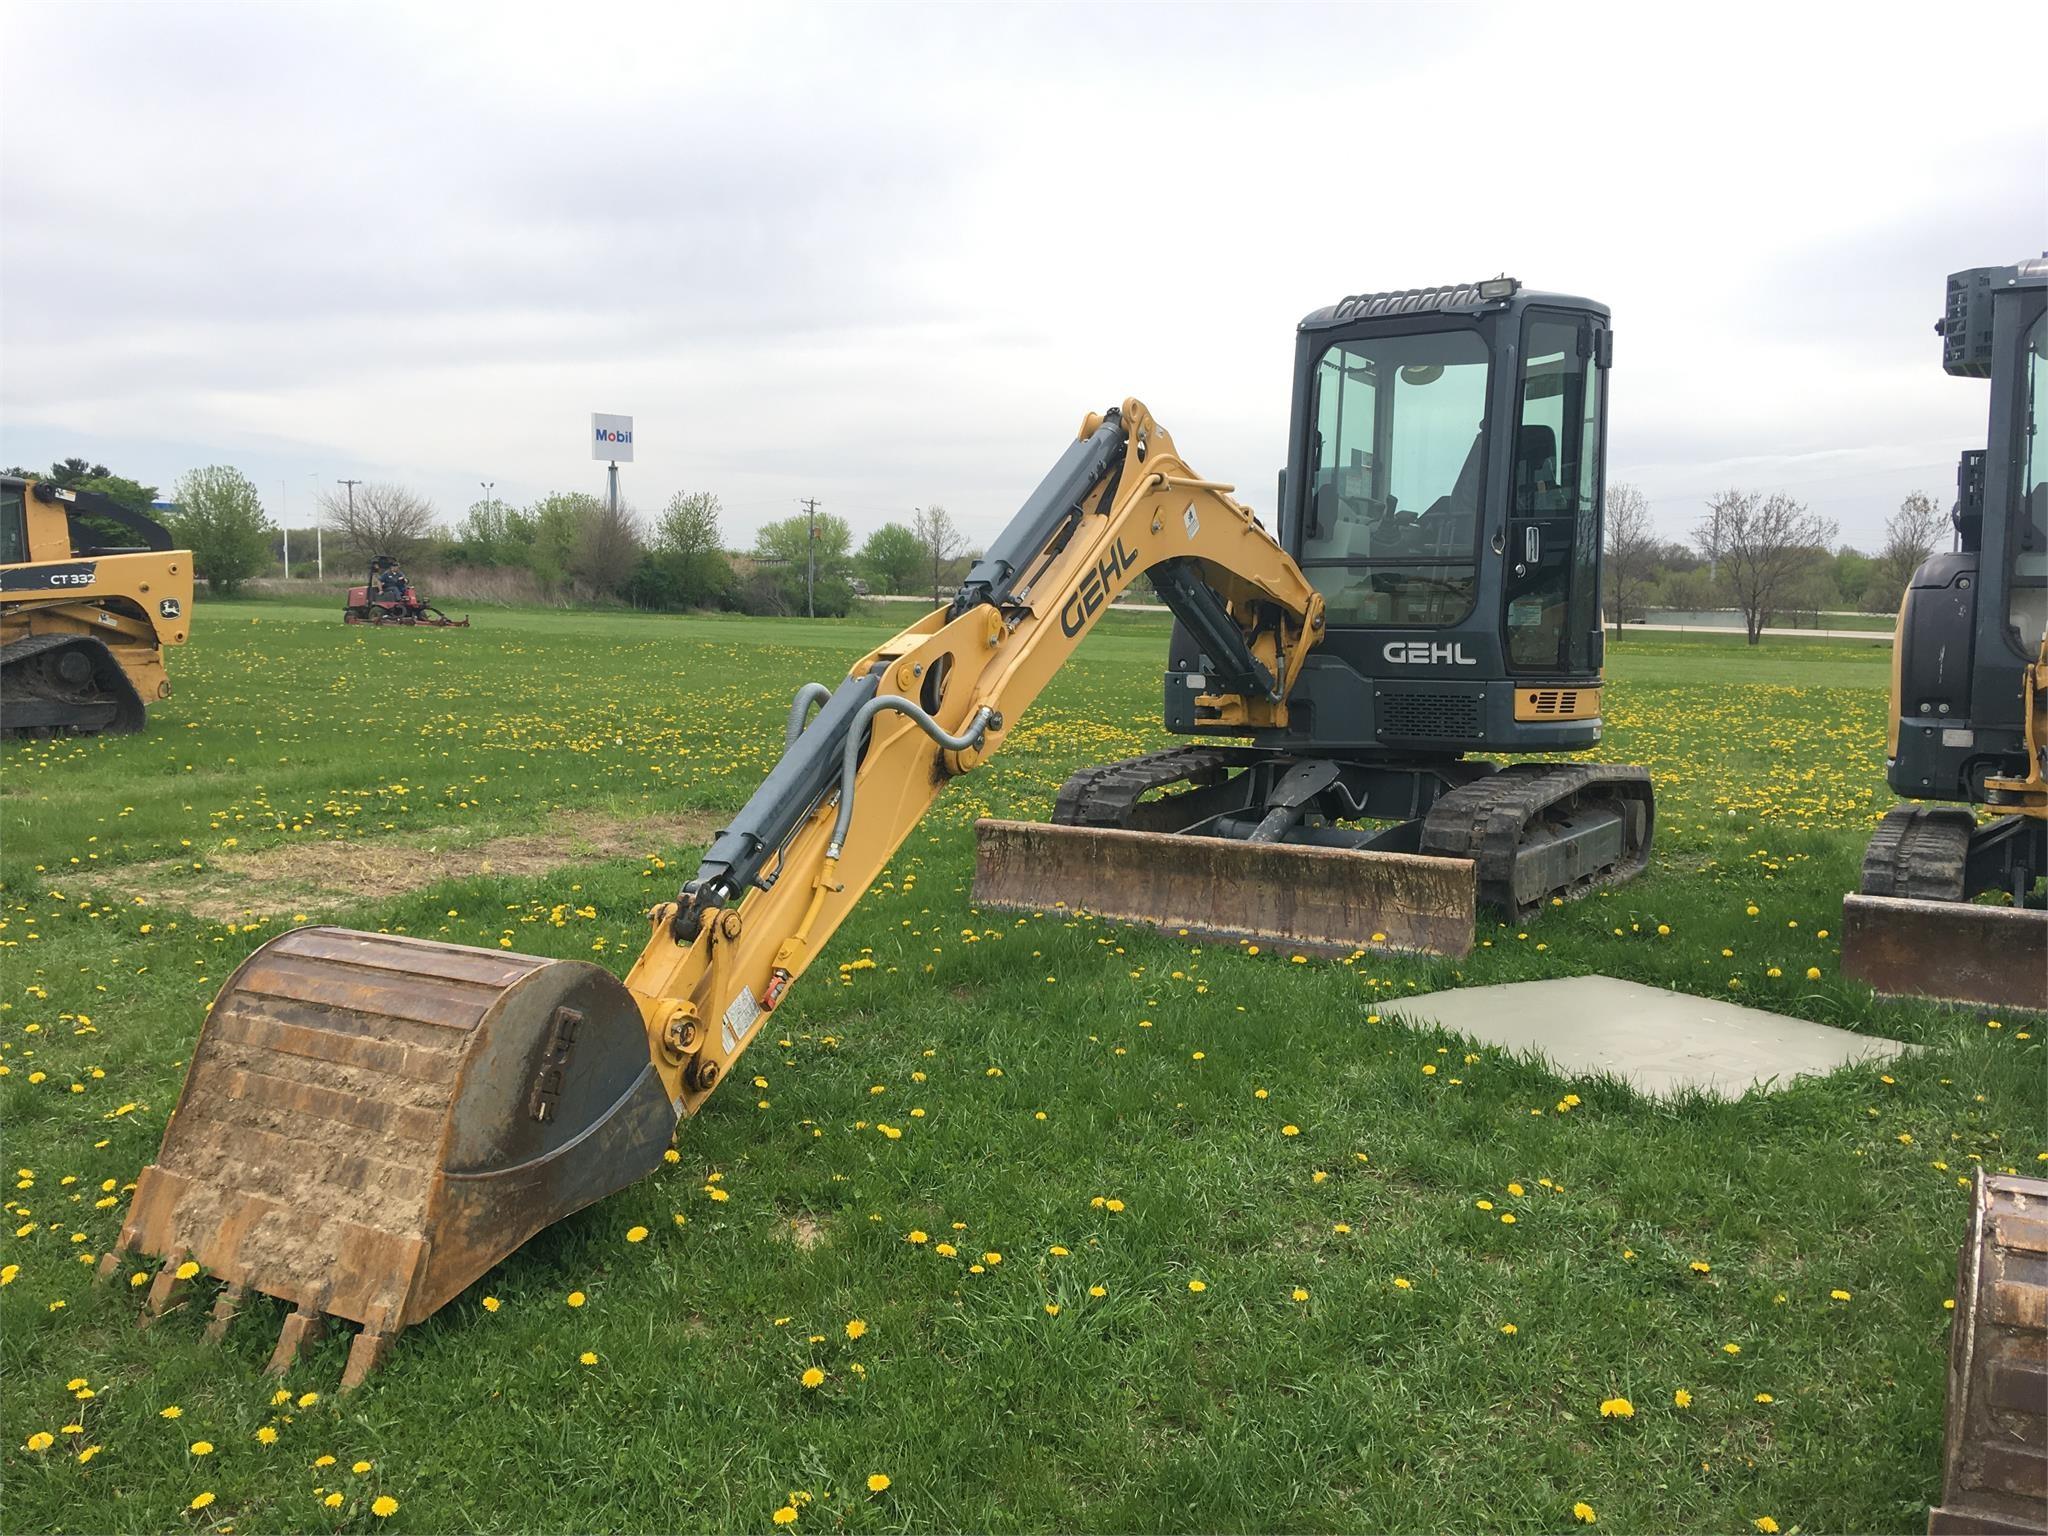 2013 Gehl Z45 Excavators and Mini Excavator